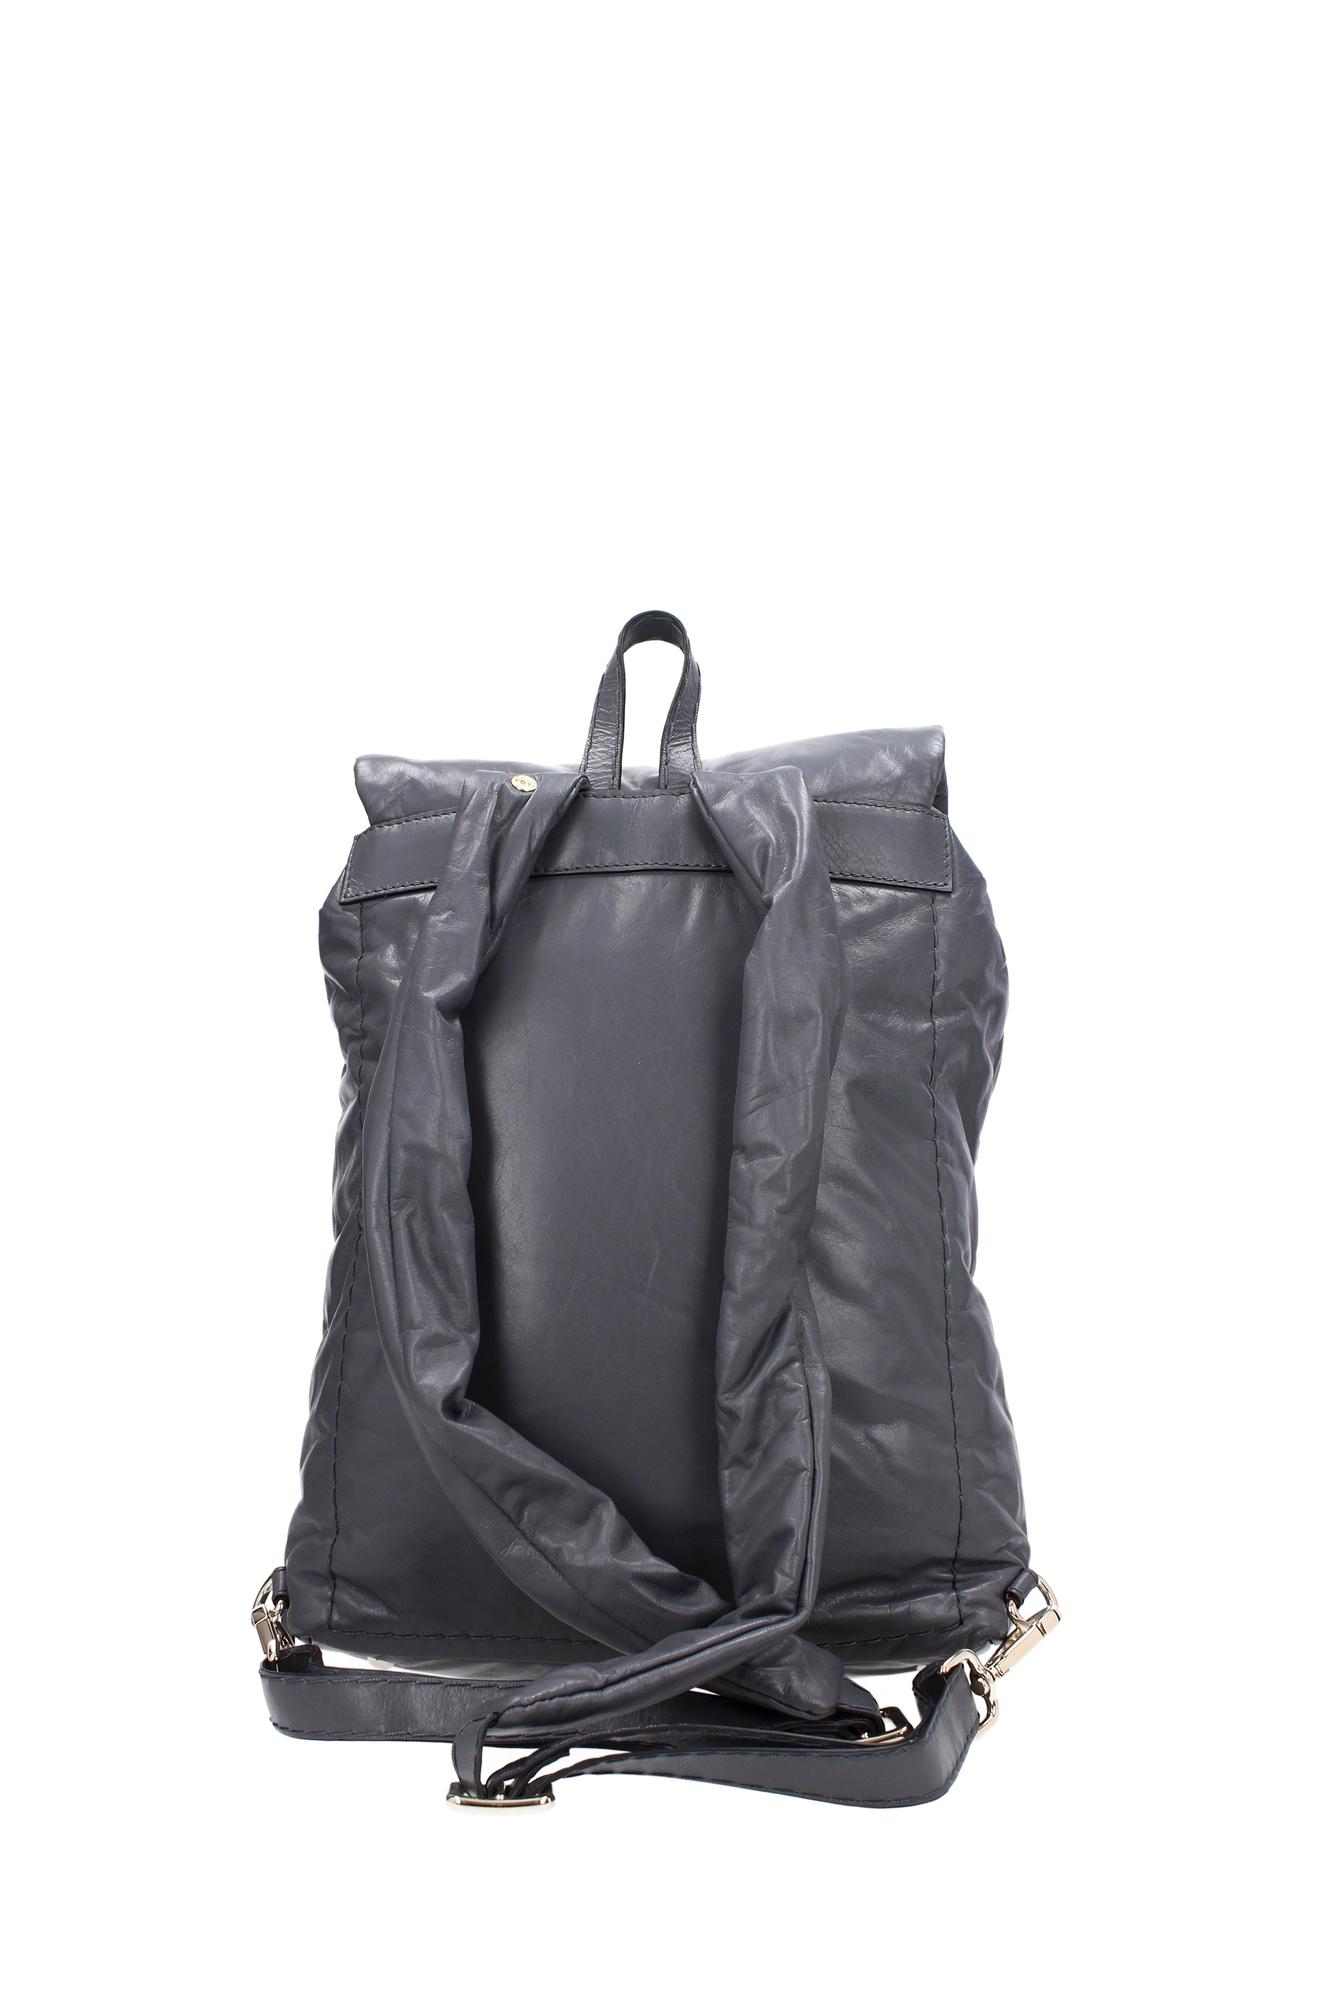 tasche rucksack zanellato damen leder grau 062778459 ebay. Black Bedroom Furniture Sets. Home Design Ideas